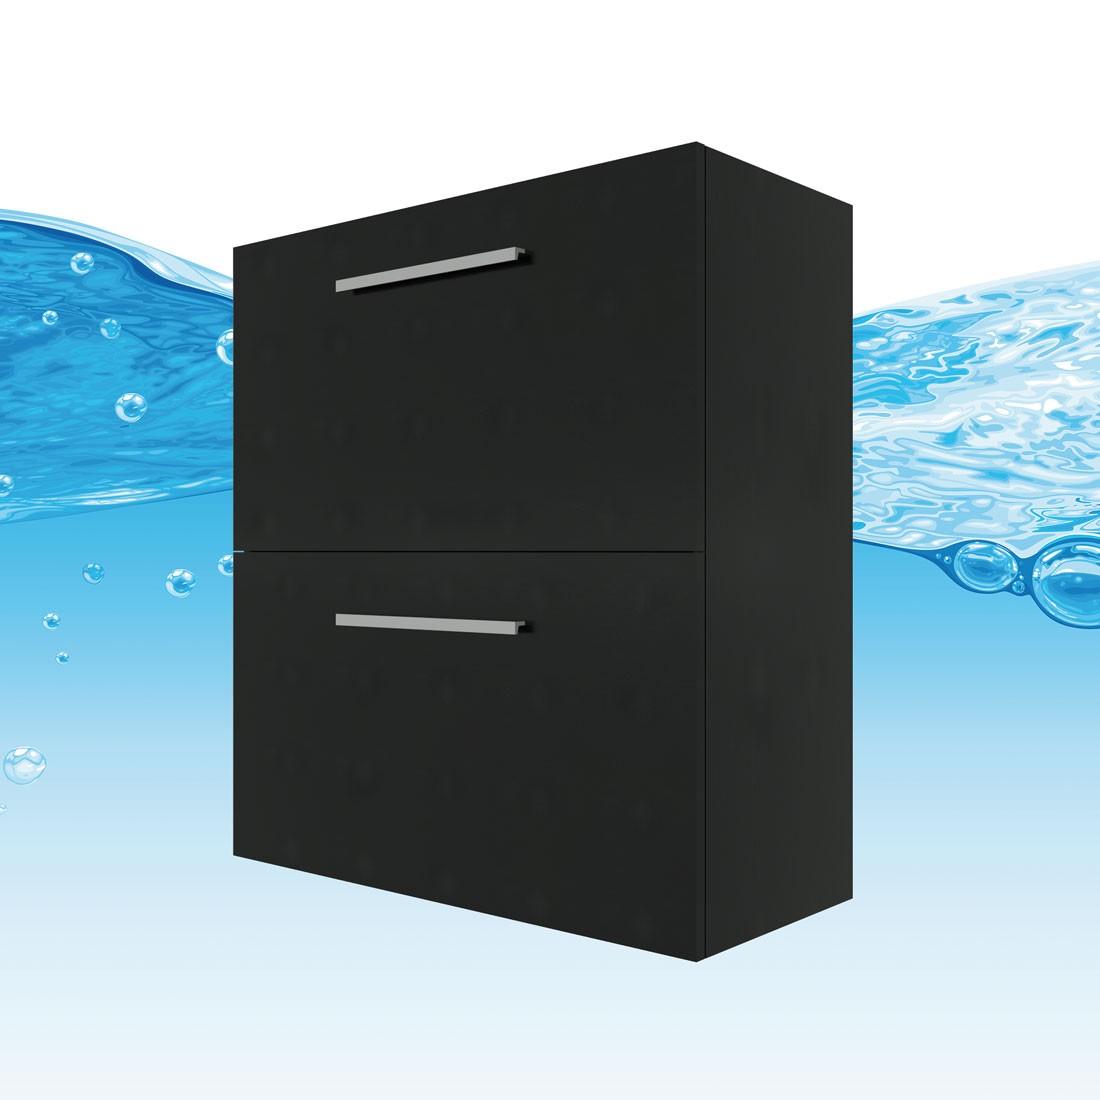 badschrank h ngeschrank 2 schubladen 80x87 5x35cm city esche schwarz. Black Bedroom Furniture Sets. Home Design Ideas